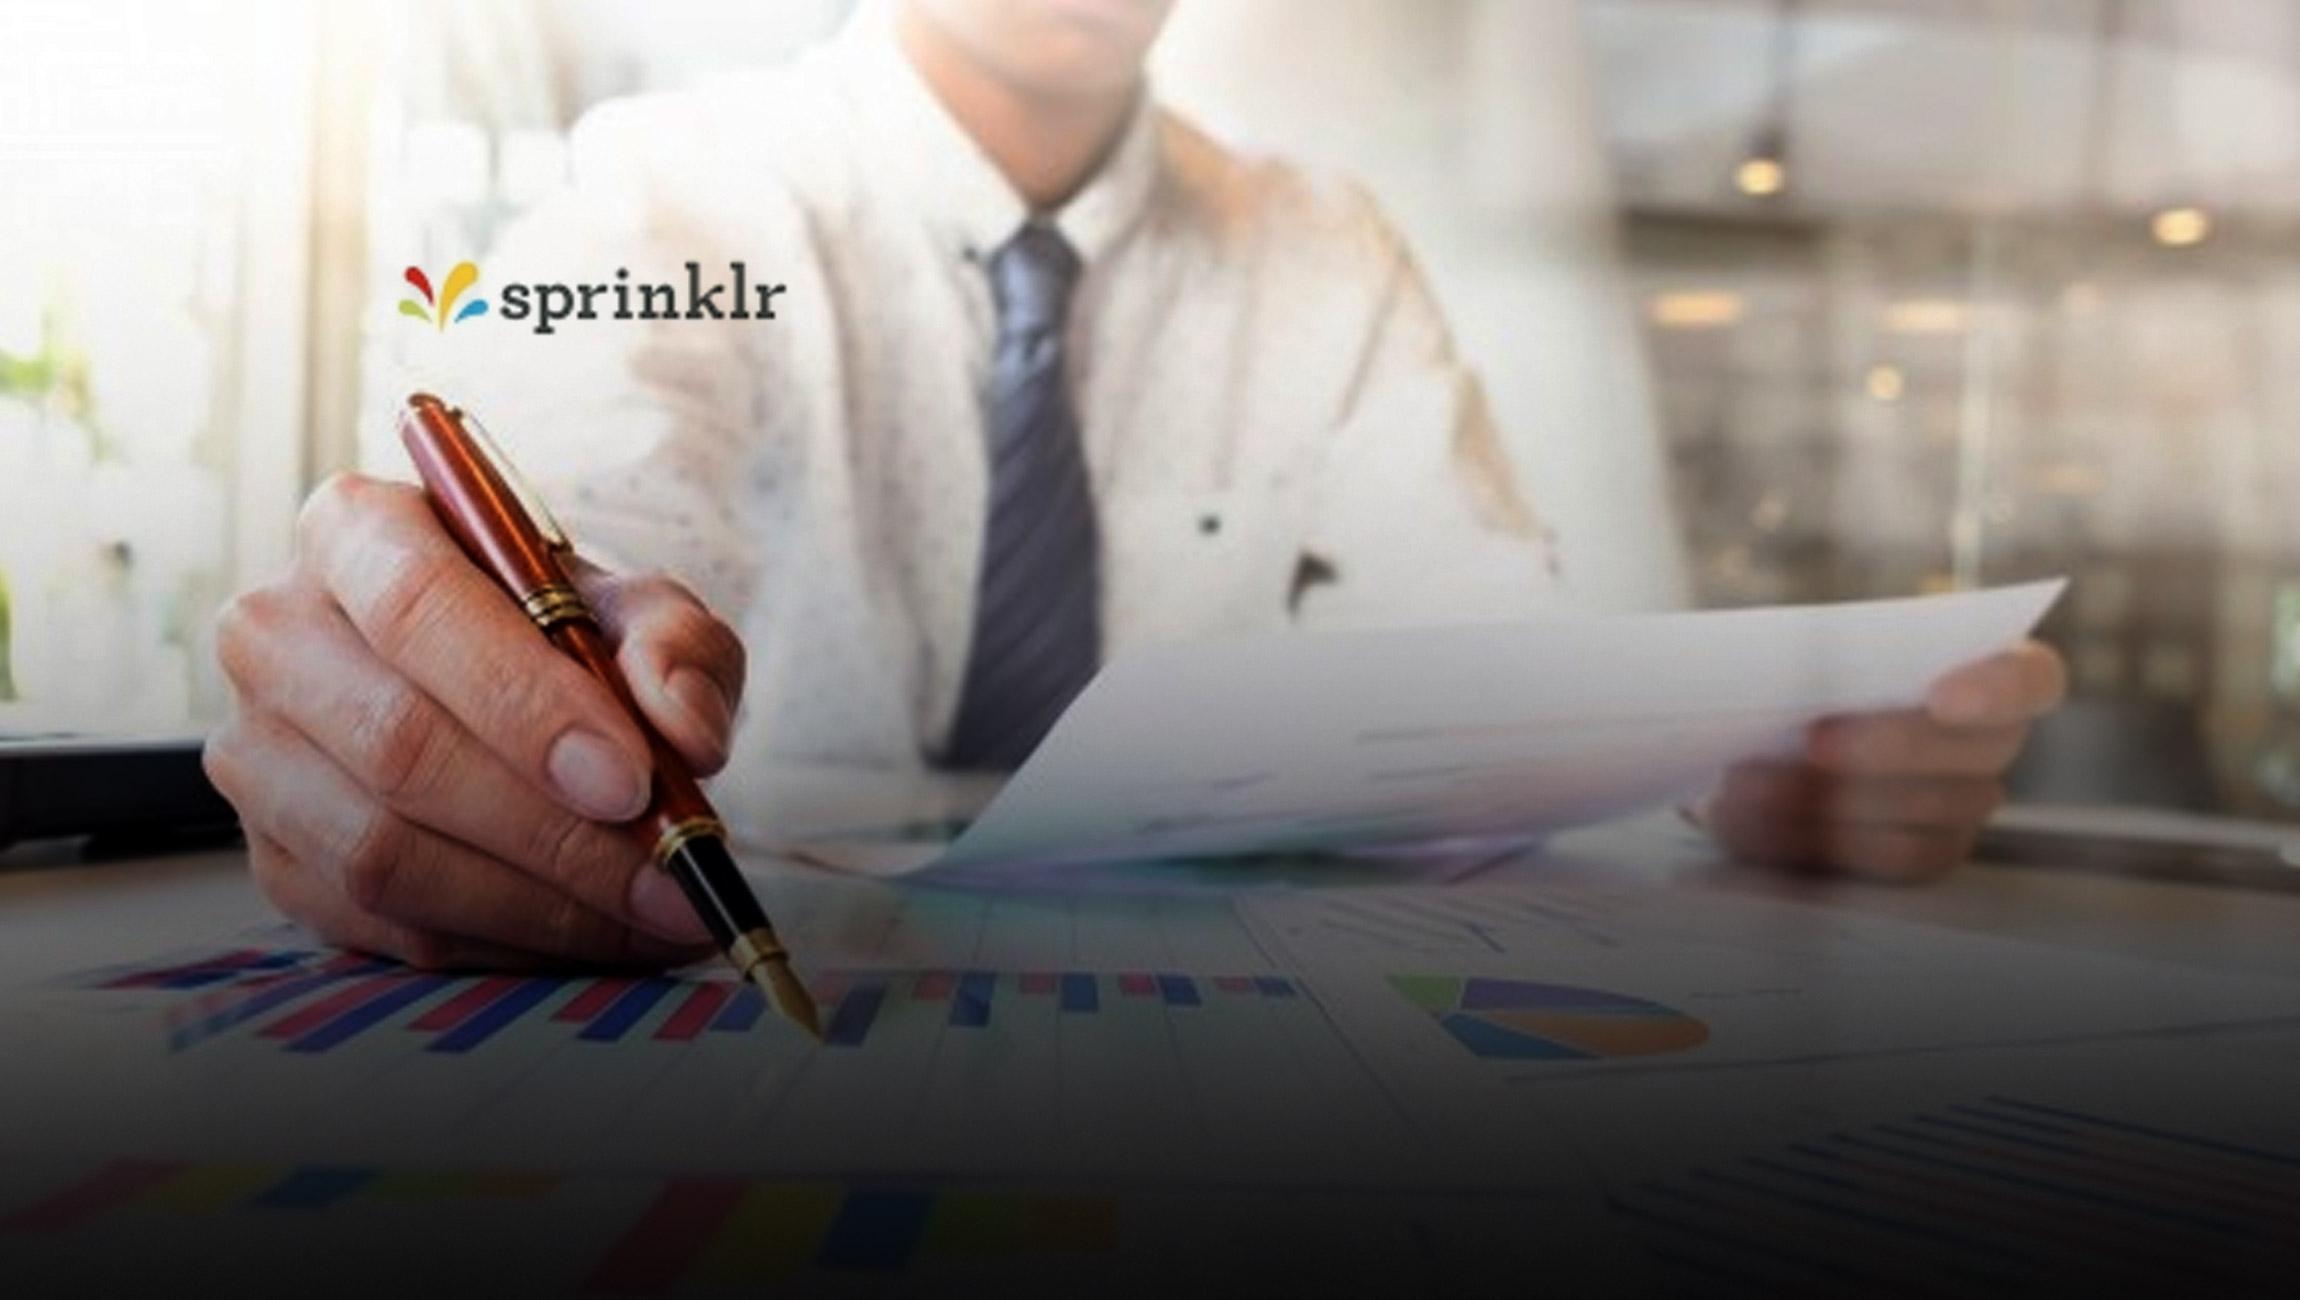 Sprinklr Achieves FedRAMP Ready Status